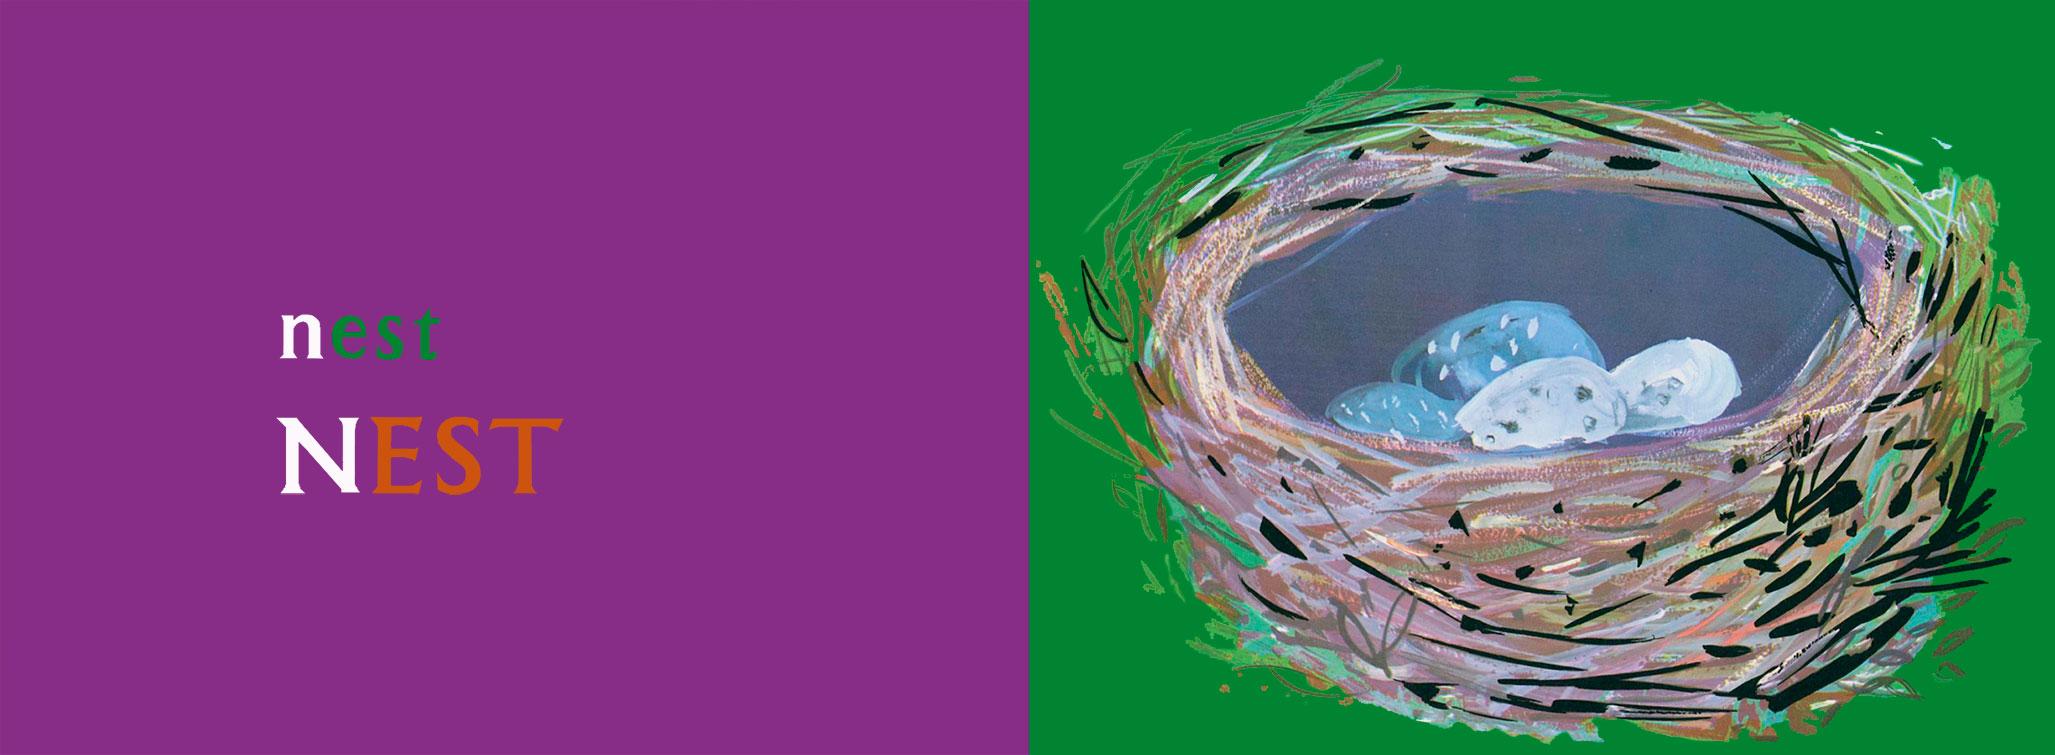 n-for-nest-brian-wildsmith-ABC.jpg